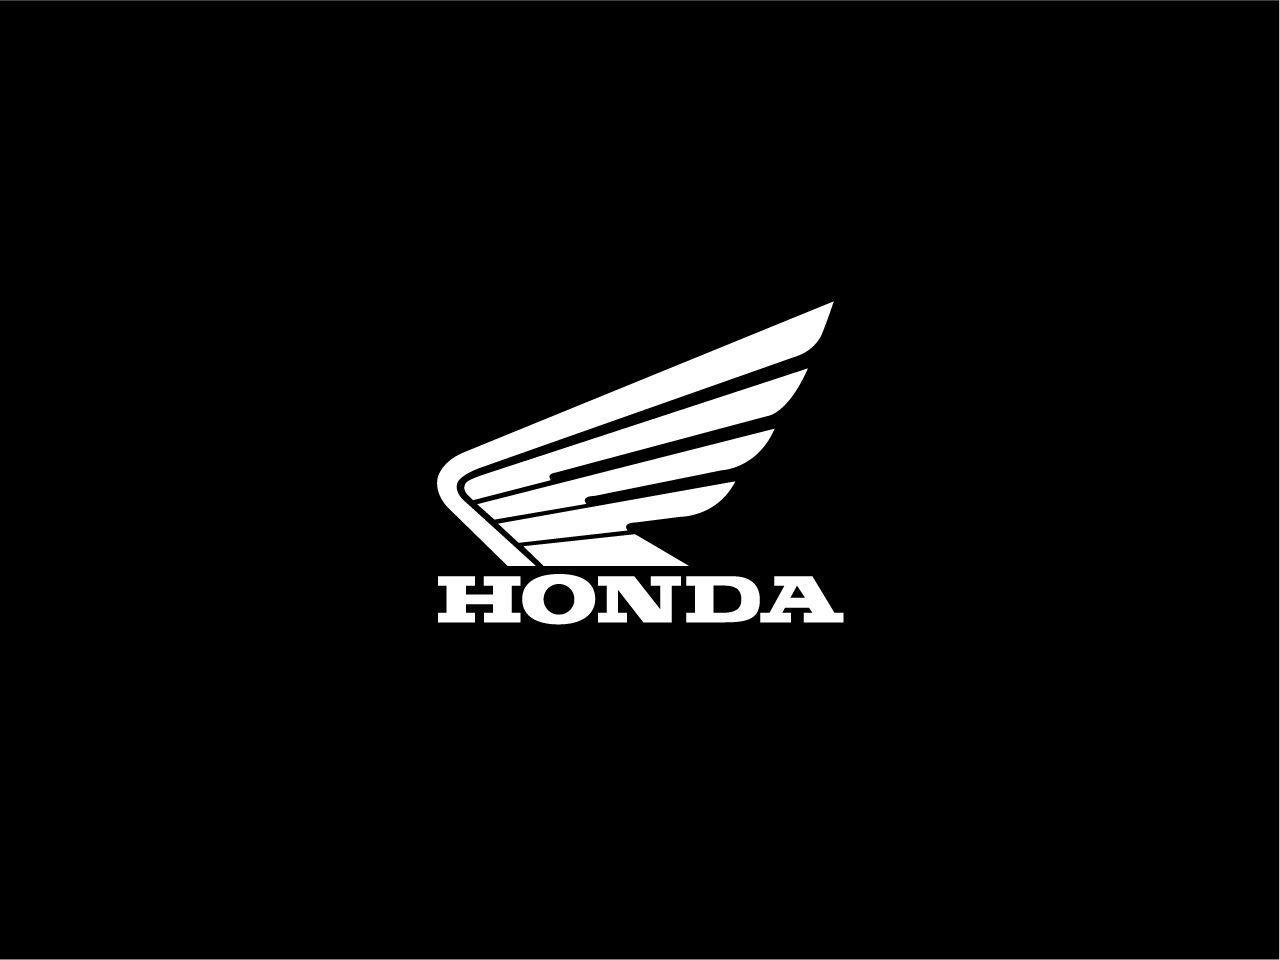 Honda Symbol Wallpapers Wallpaper Cave